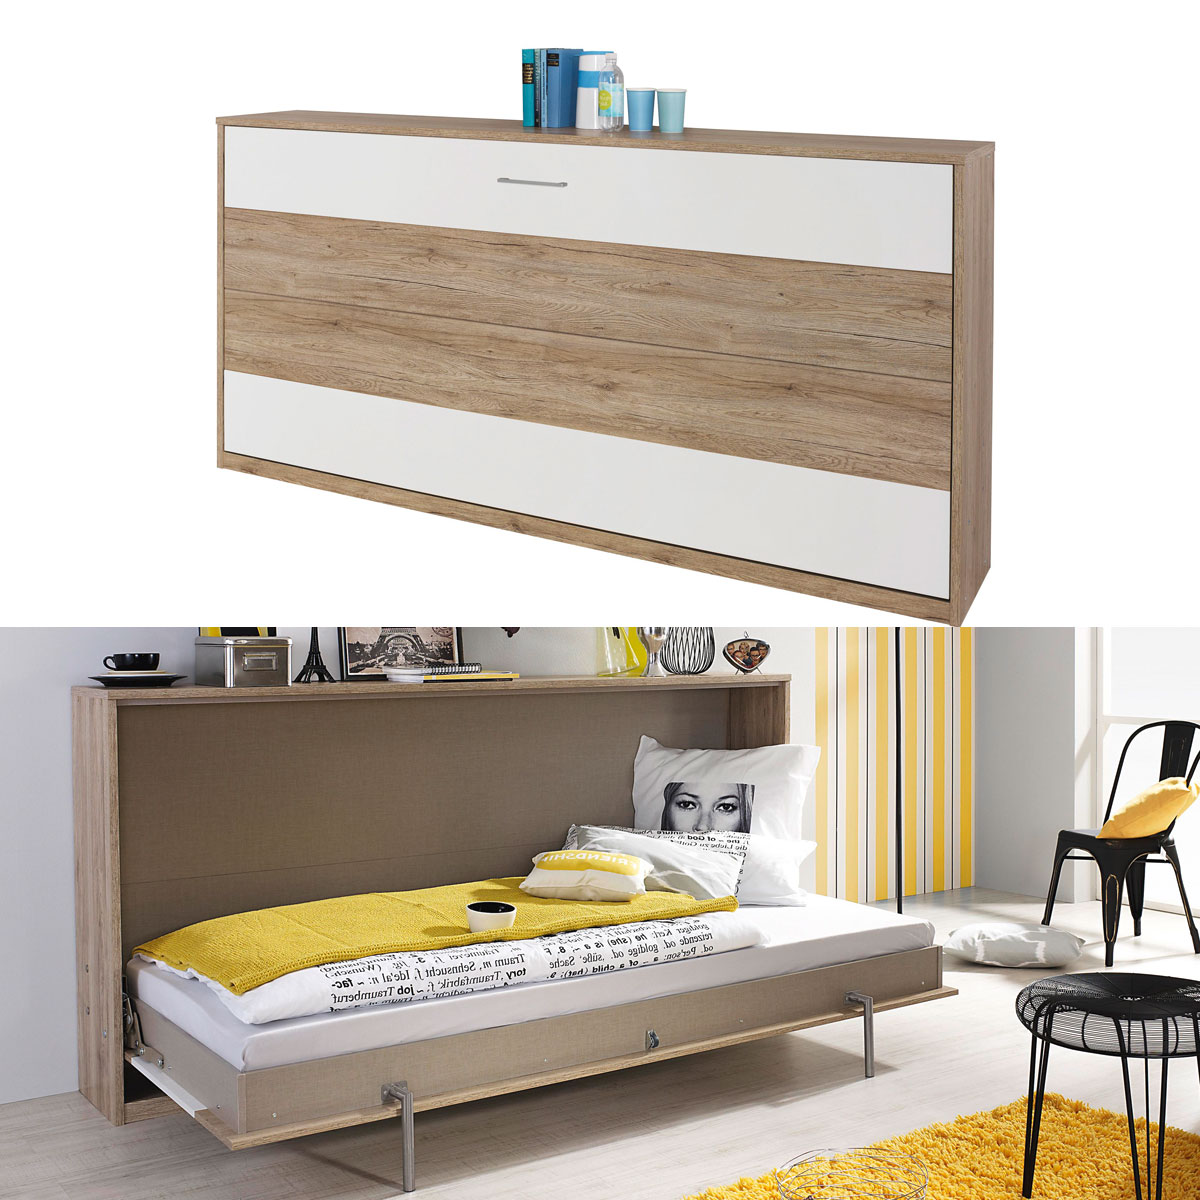 schrankbett albero 90x200cm 7 designs funktionsbett kinderbett klappbett ebay. Black Bedroom Furniture Sets. Home Design Ideas